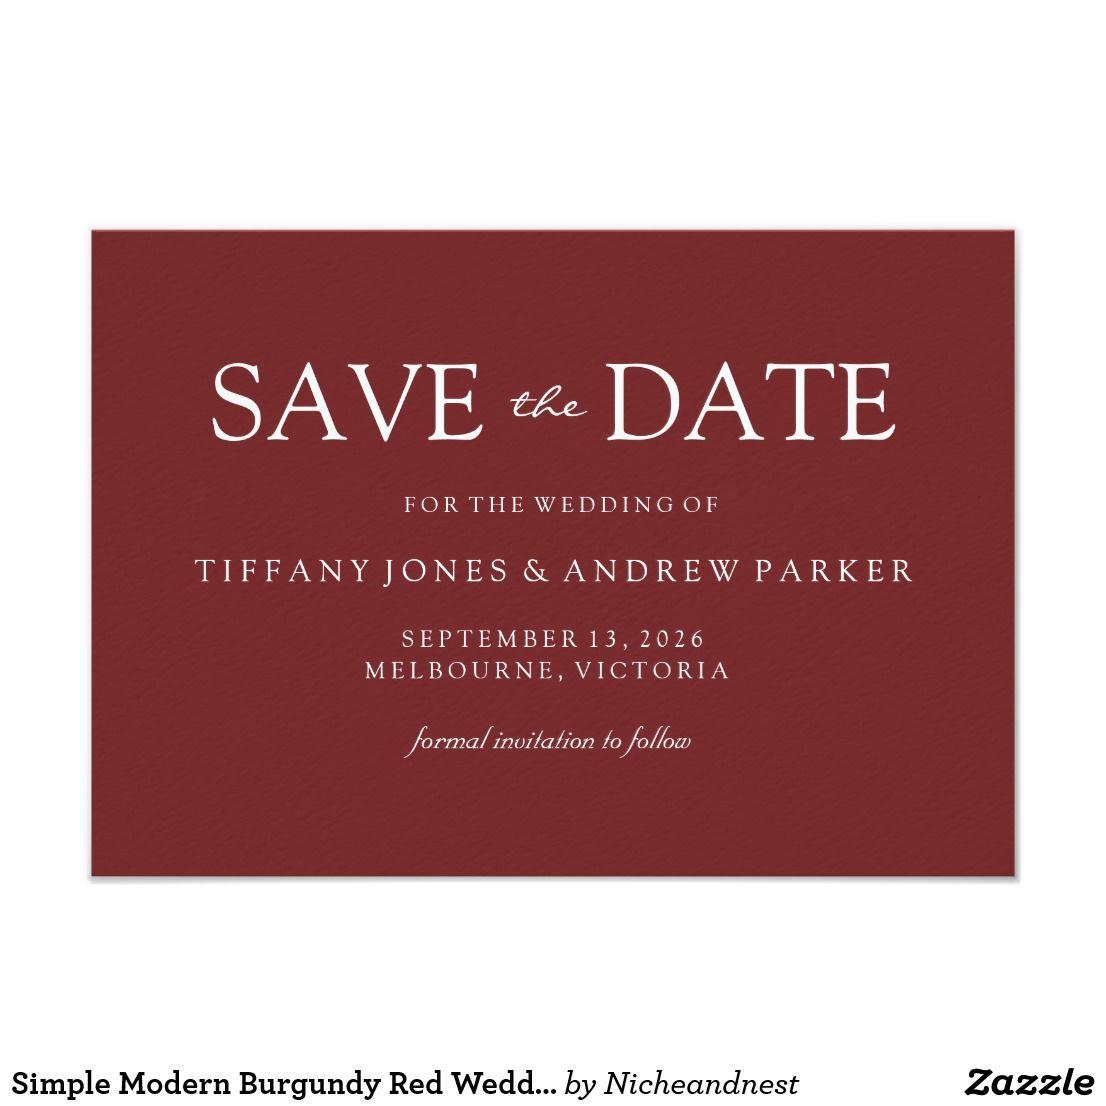 Simple Modern Burgundy Red Wedding Save the date | Wedding ...